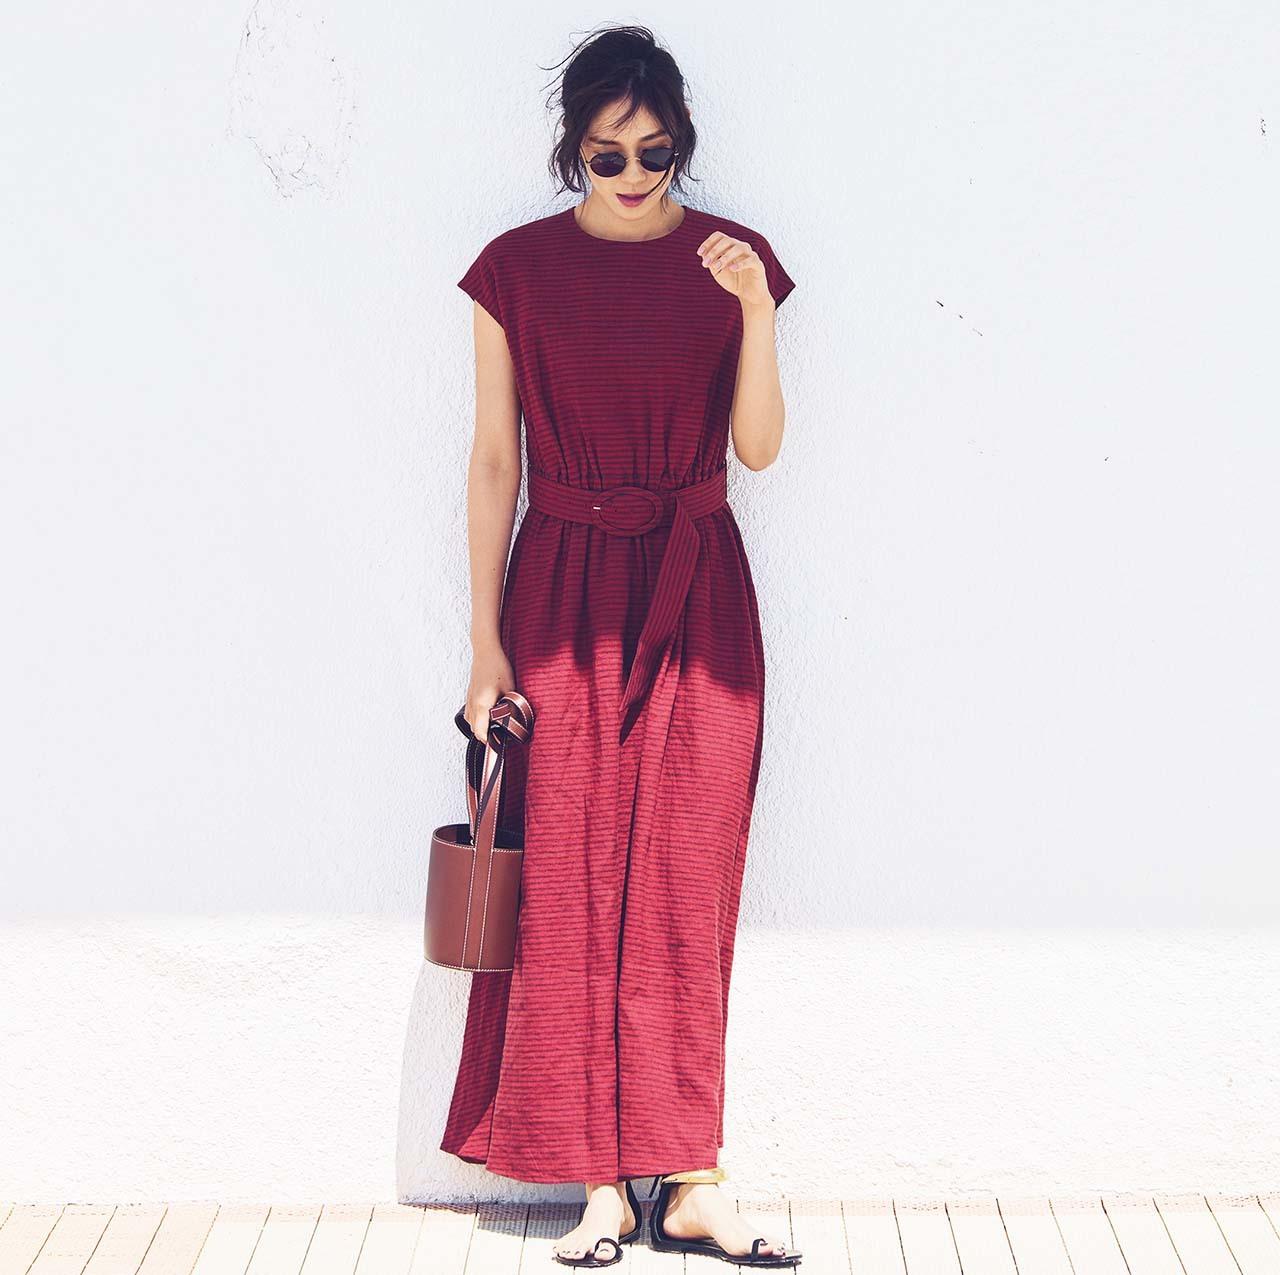 BLUEBIRD BLUEVARDのロングリネンワンピースを着たモデルの竹内友梨さん